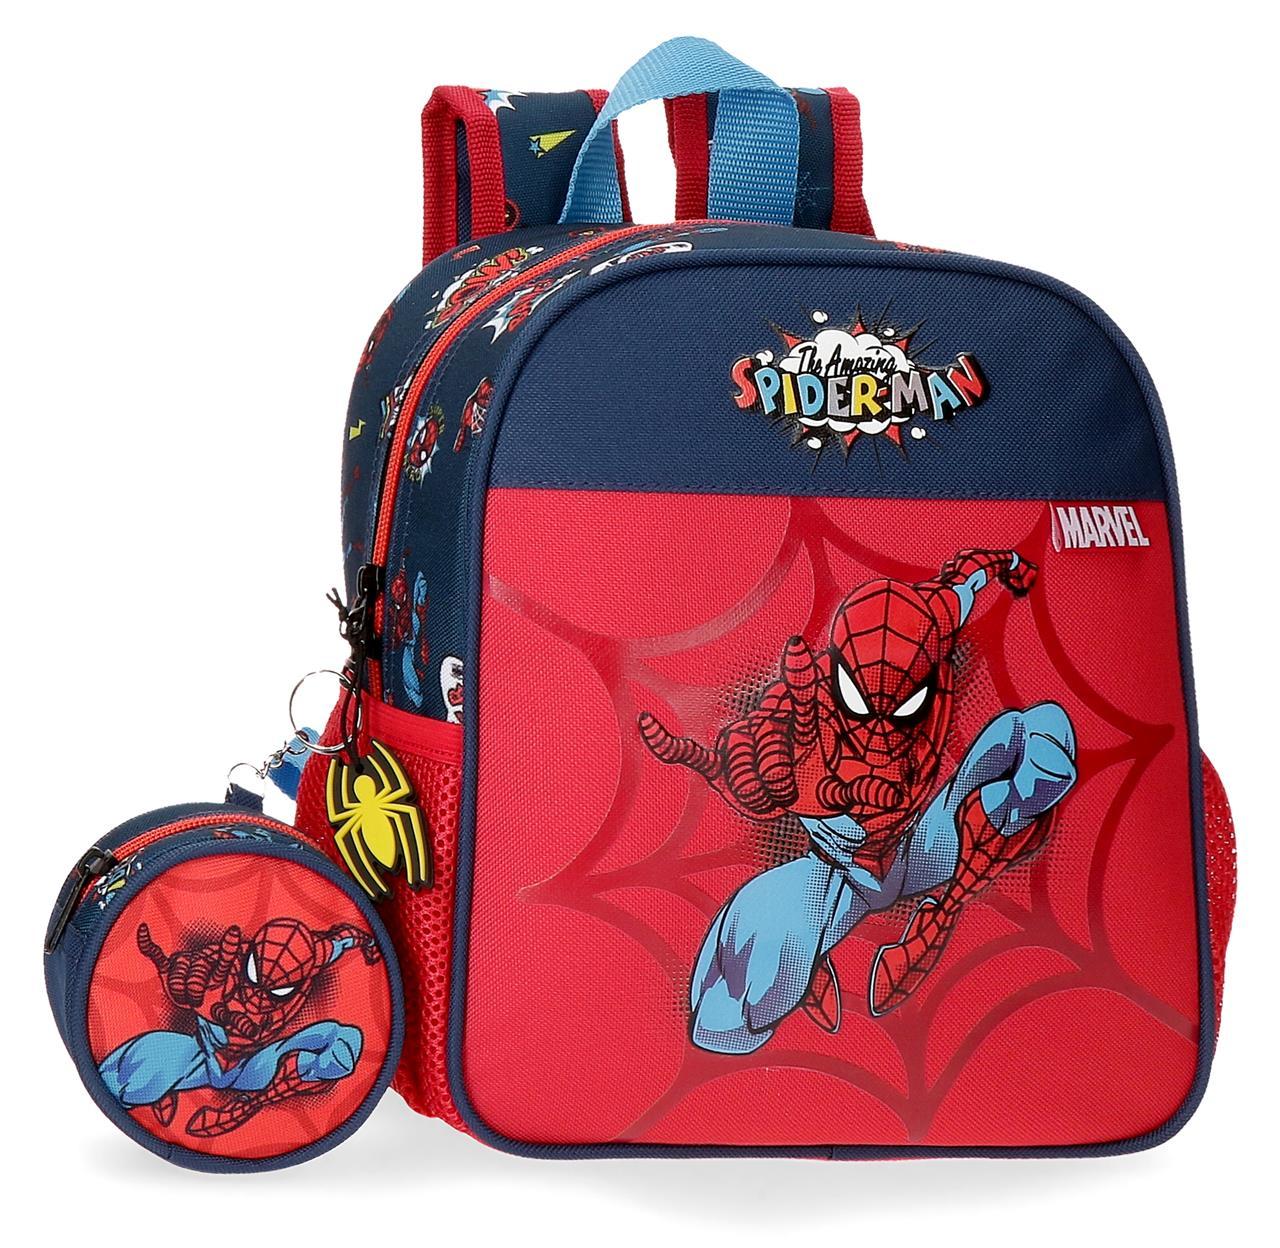 2072021 mochila pequeña 25cm spiderman pop